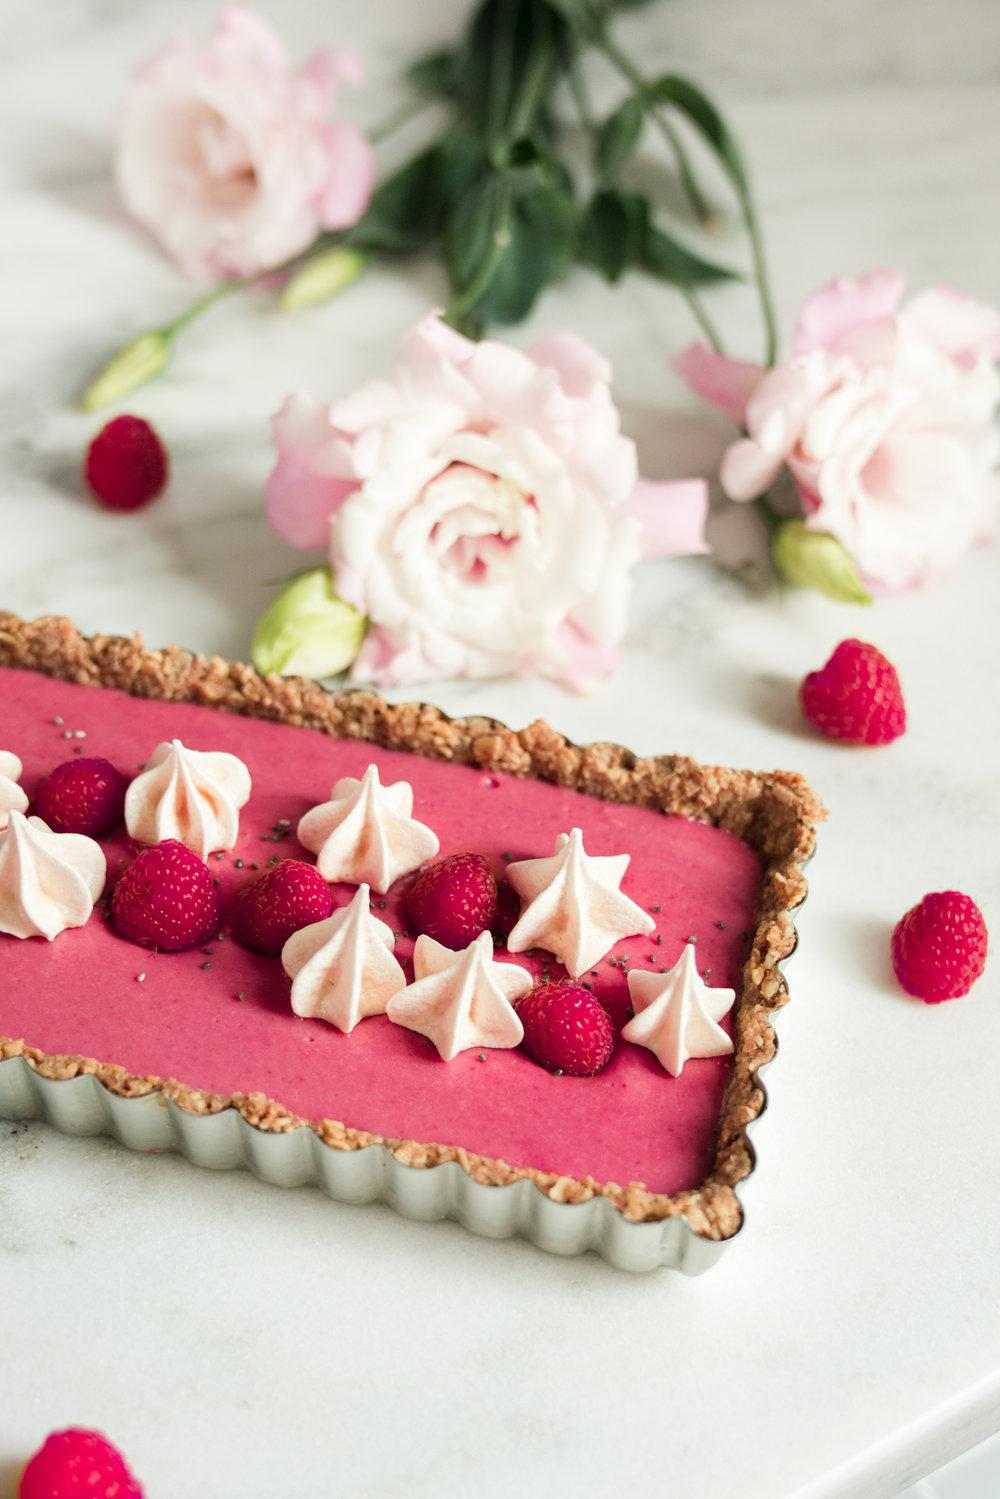 Raspberry Beet Tart with Oat Walnut Crust